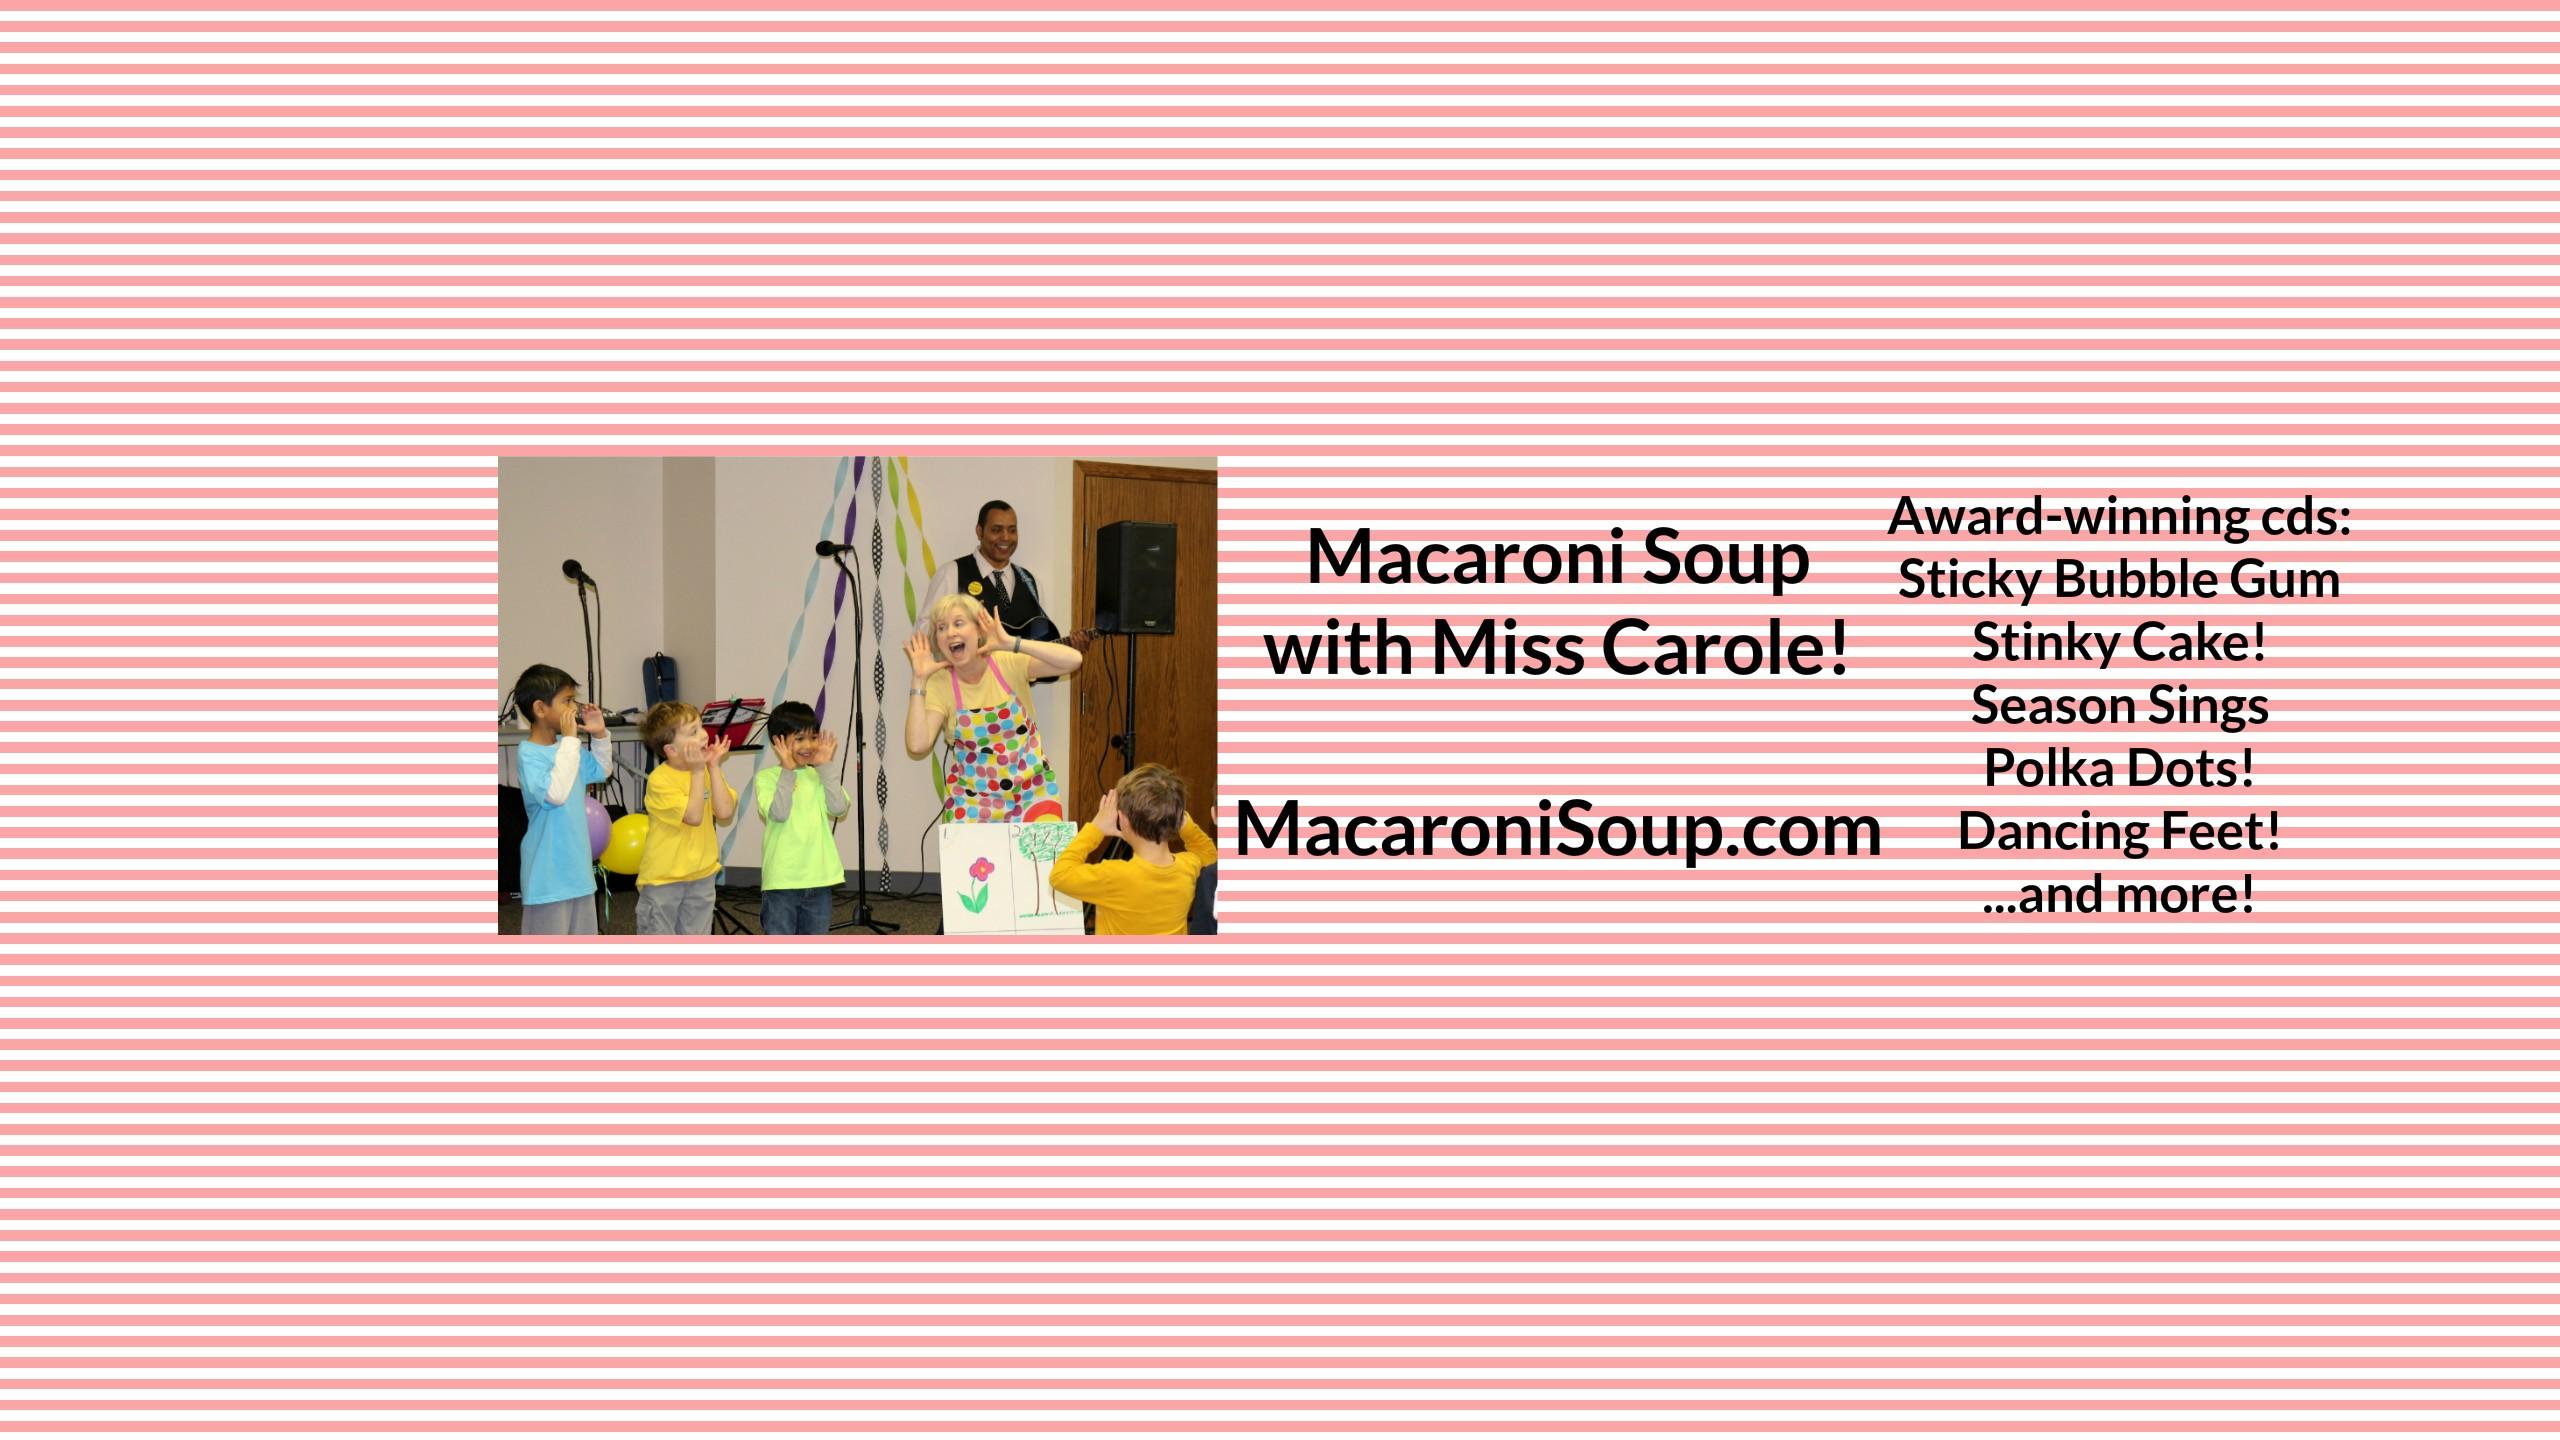 Macaroni Soup covid free